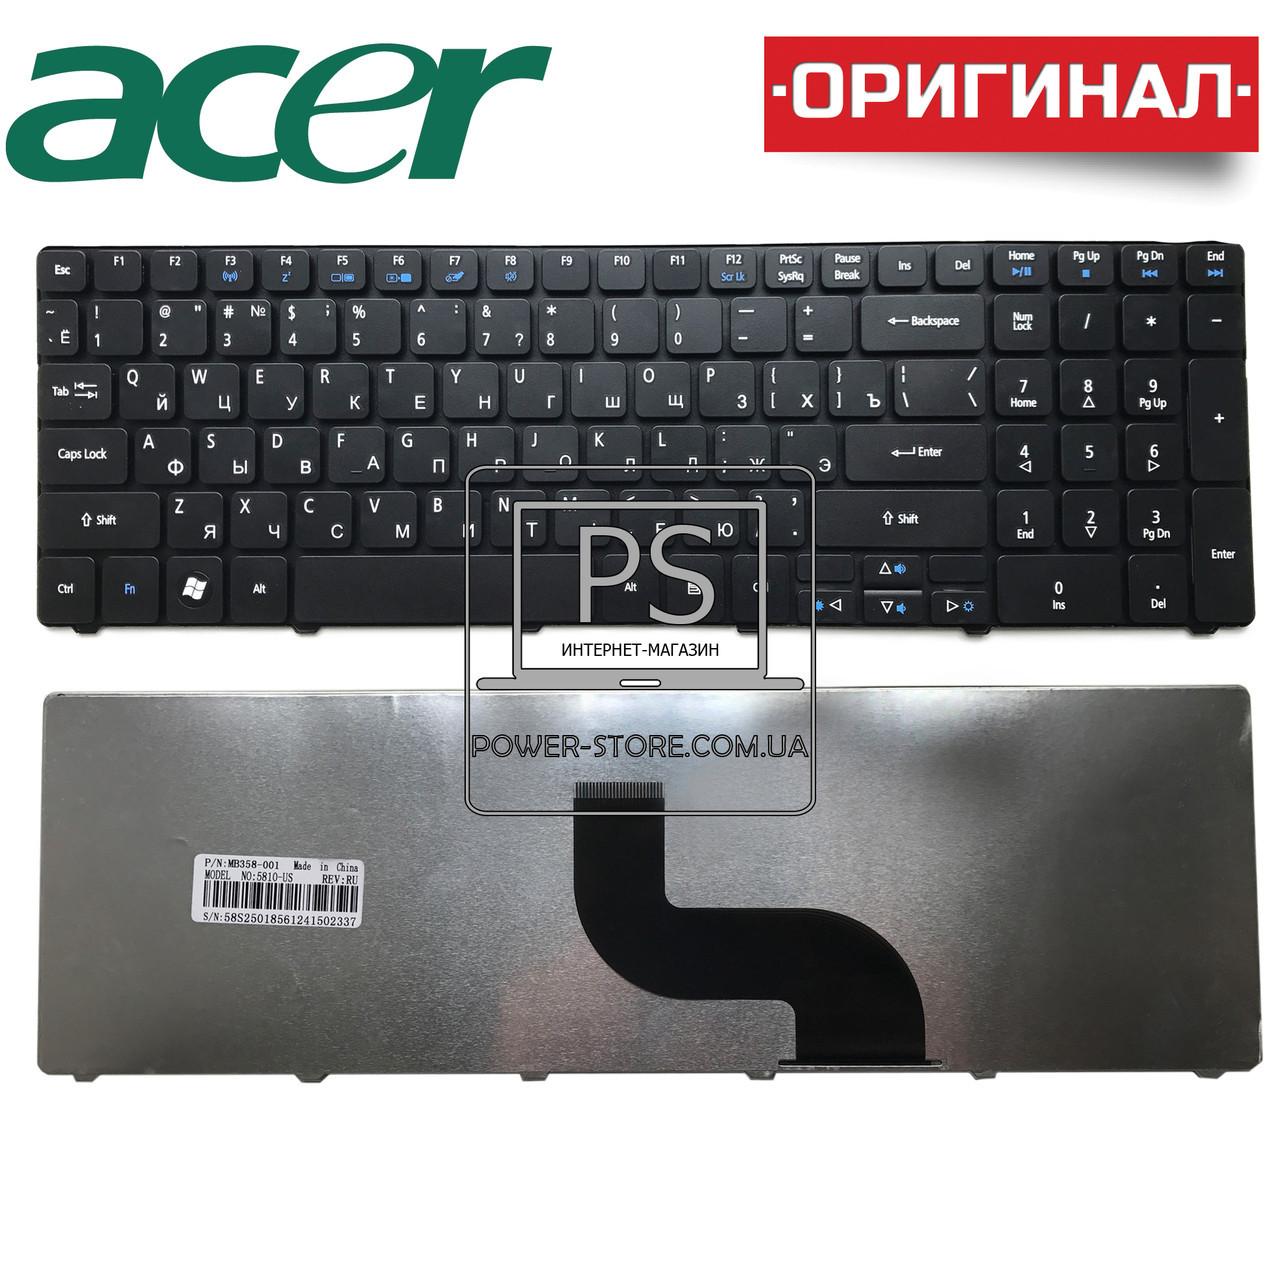 Клавиатура  для ноутбука ACER 9J.N1H82.00G, 9J.N1H82.00H, 9J.N1H82.00I, 9J.N1H82.00J,